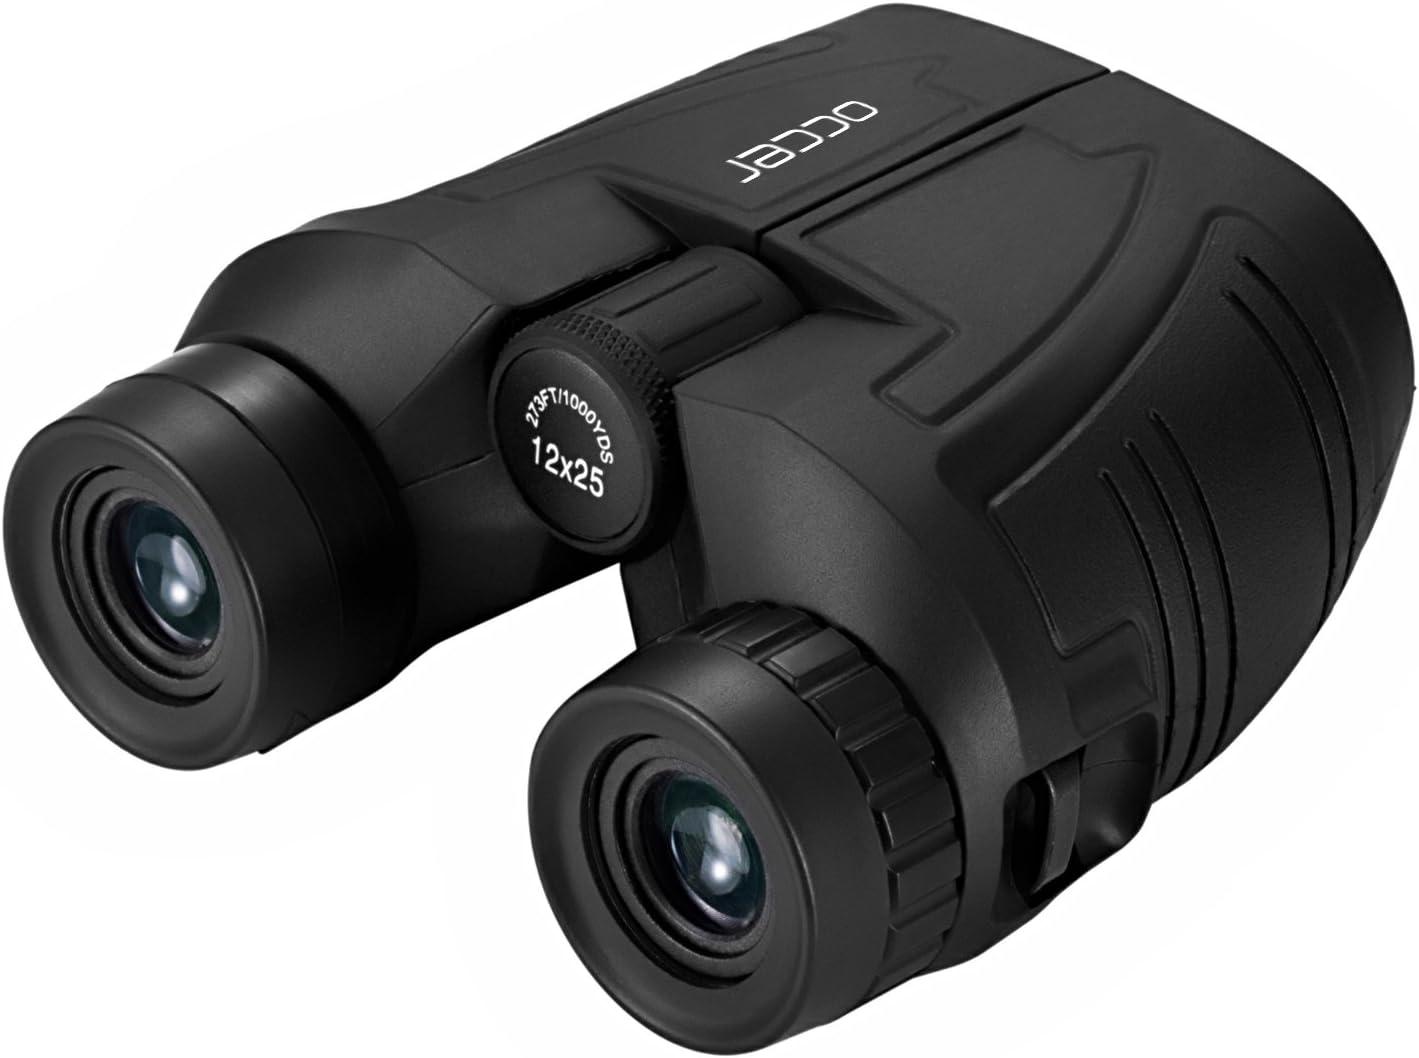 Occer – 888635 - best binoculars